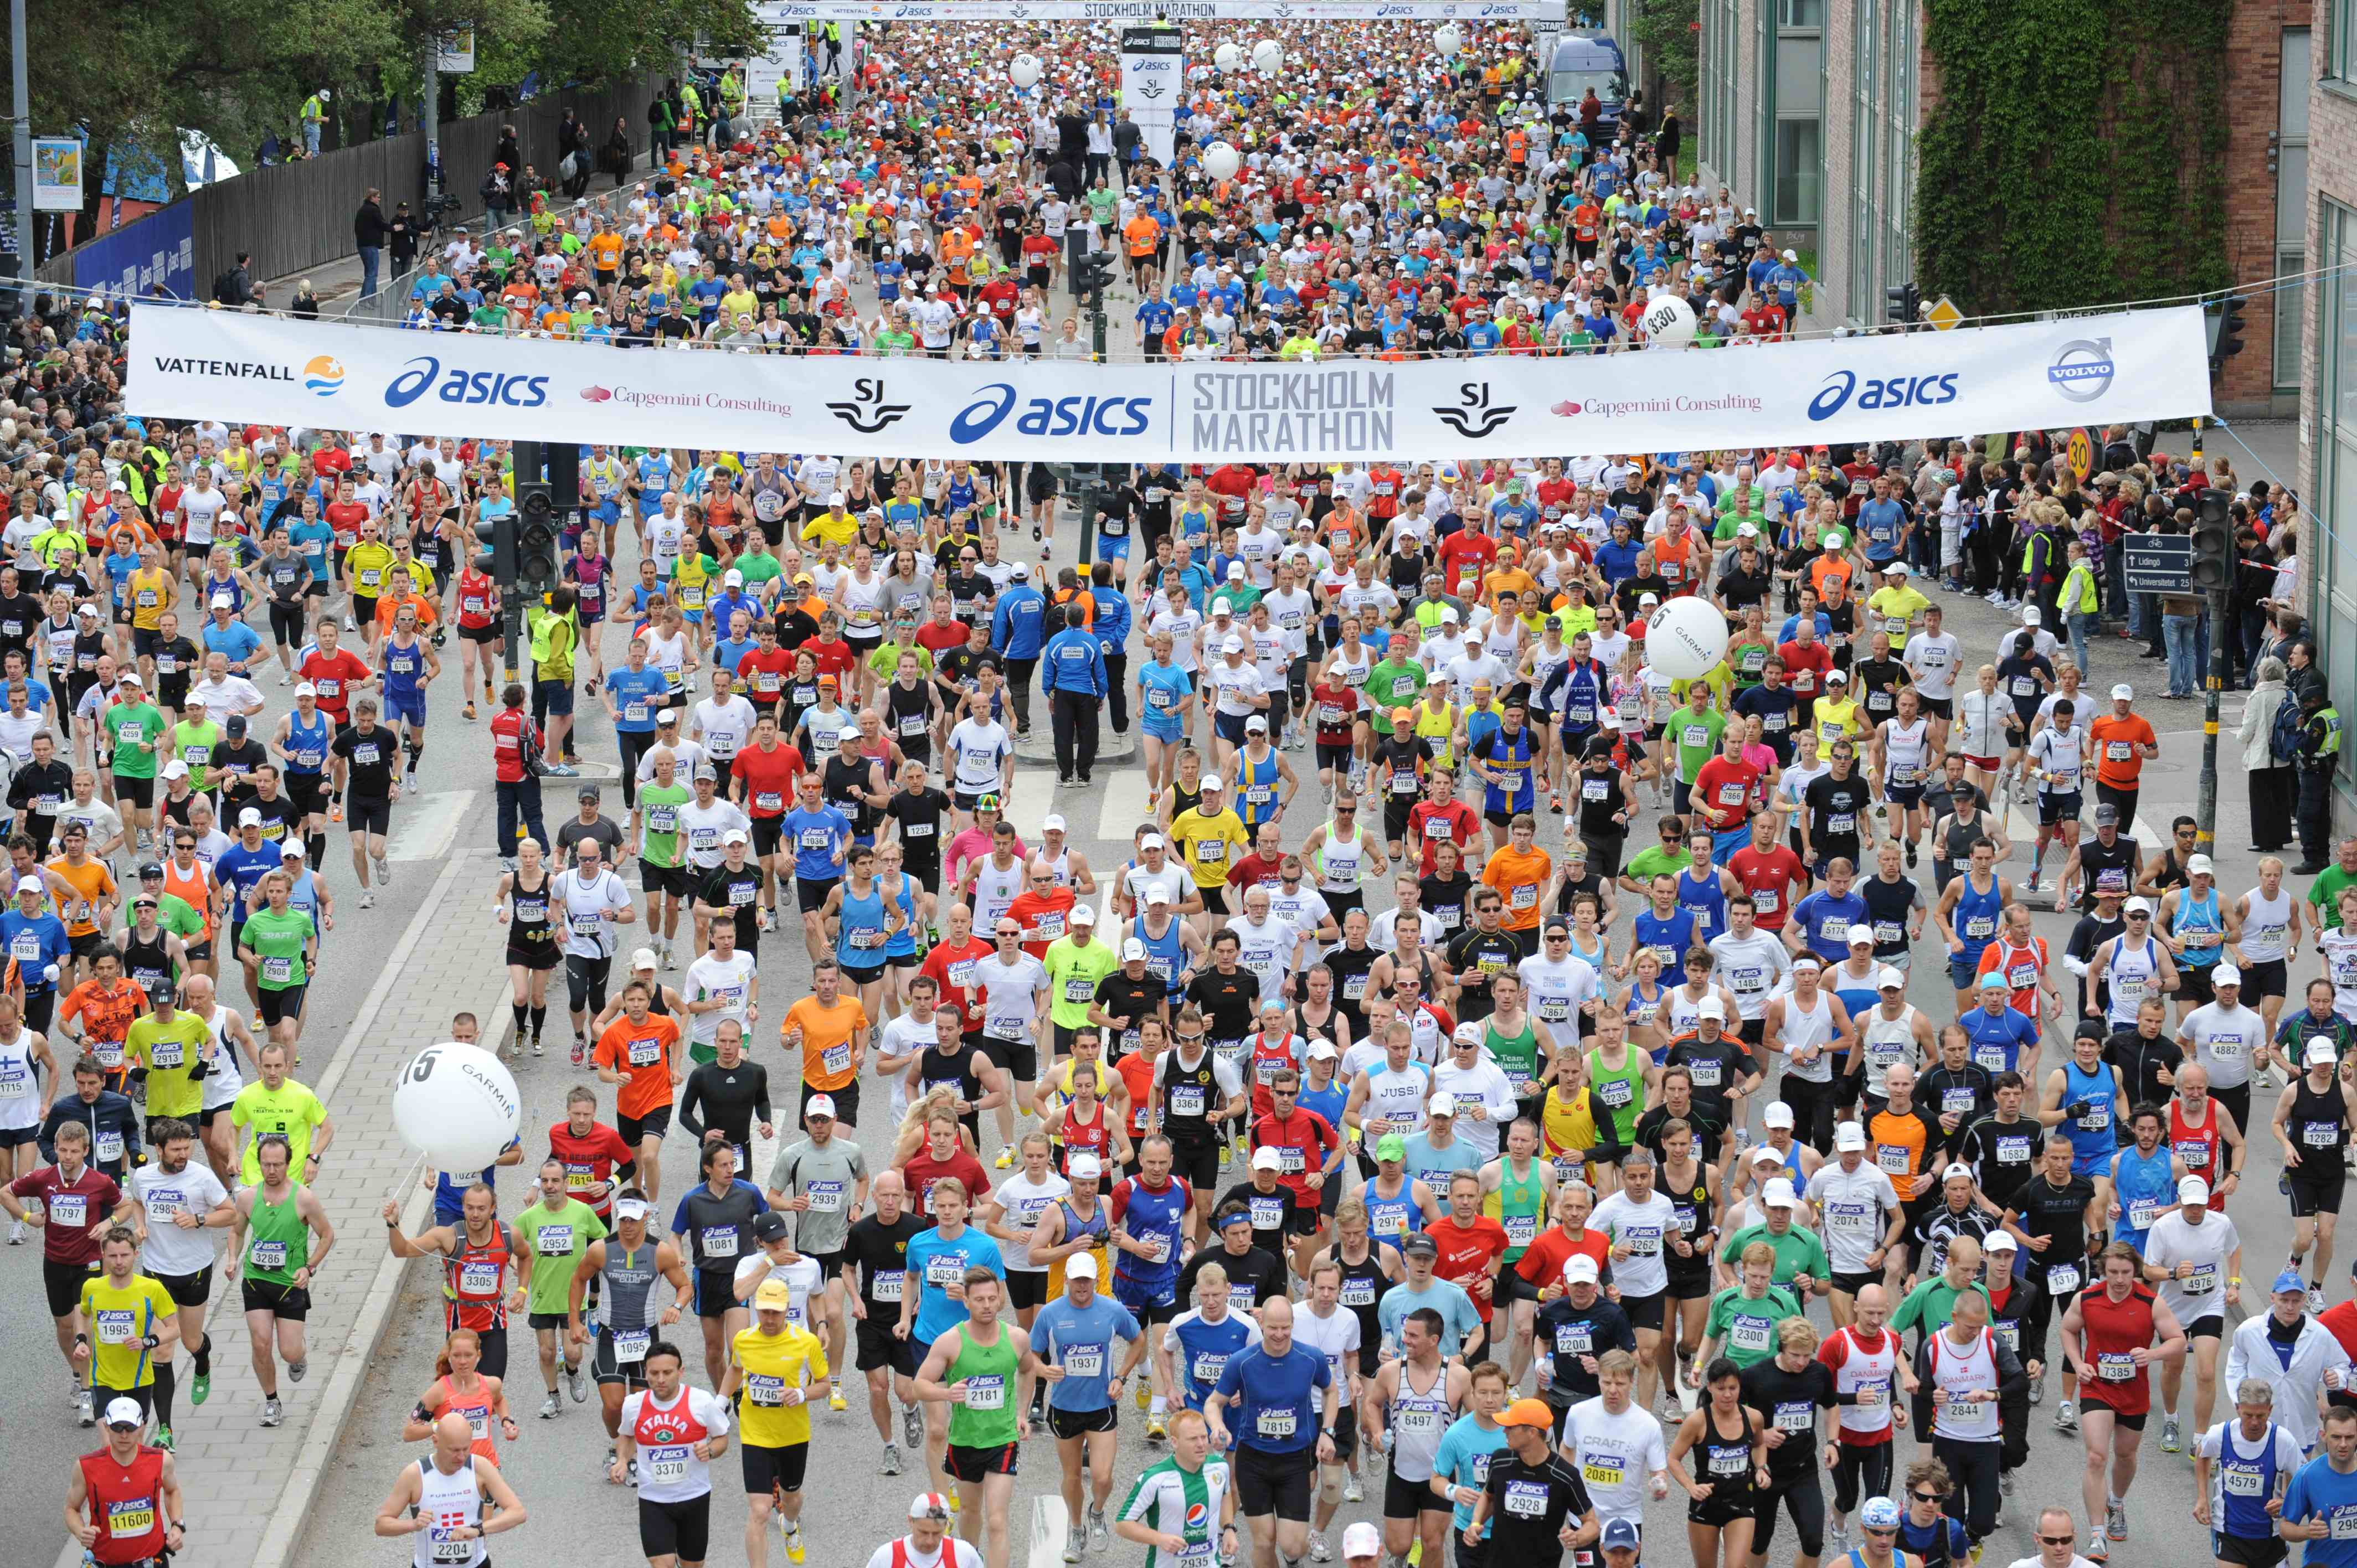 Asics Stockholm Marathon, fot. materiały prasowe